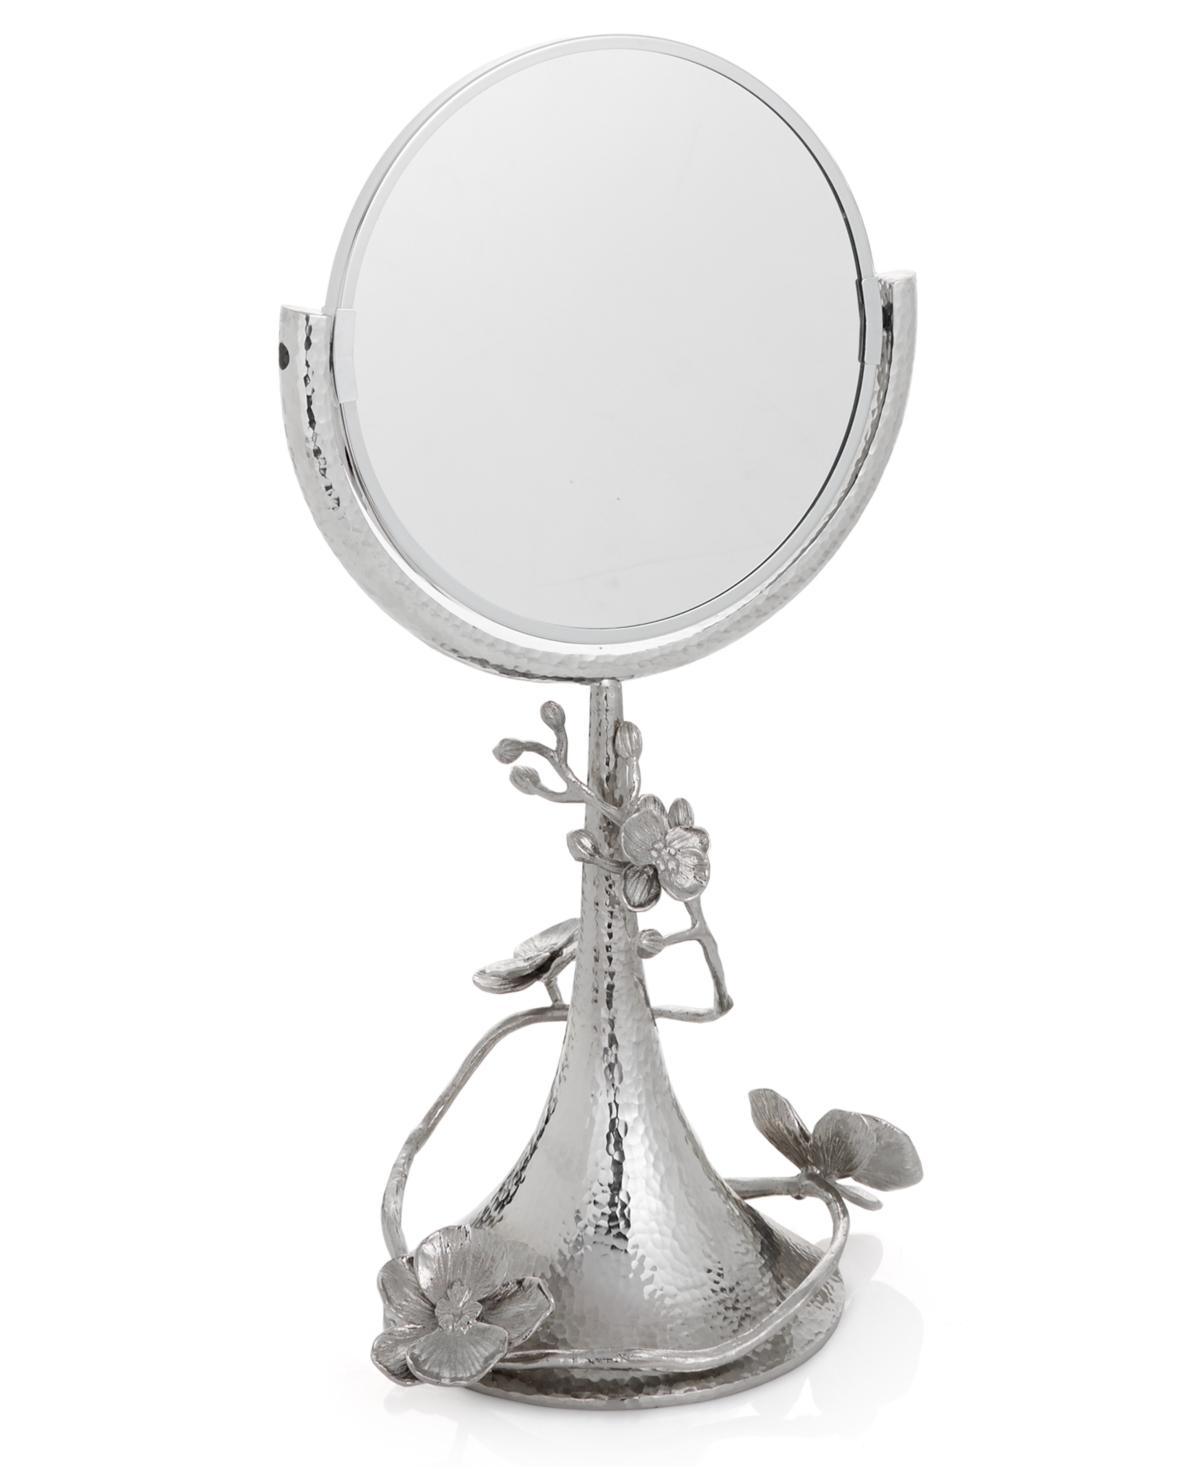 Michael Aram White Orchid Vanity Mirror